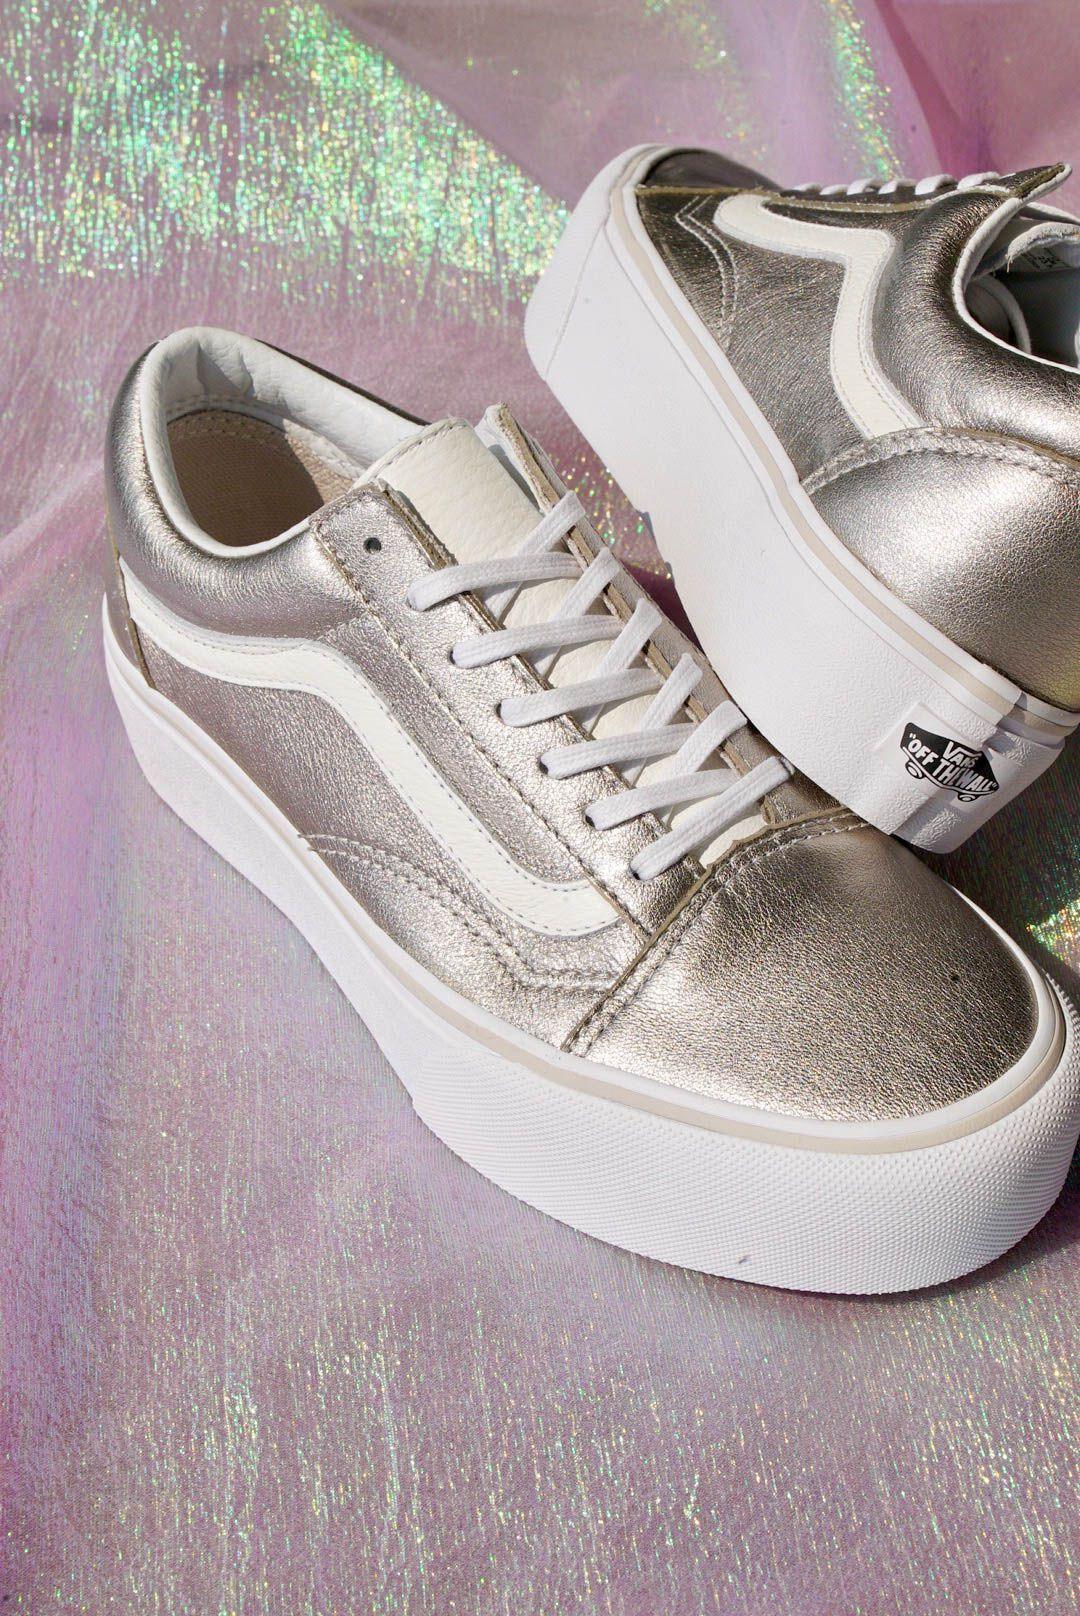 a7e16939b174 Vans Old Skool Gray Gold   True White Platform Skate Shoes